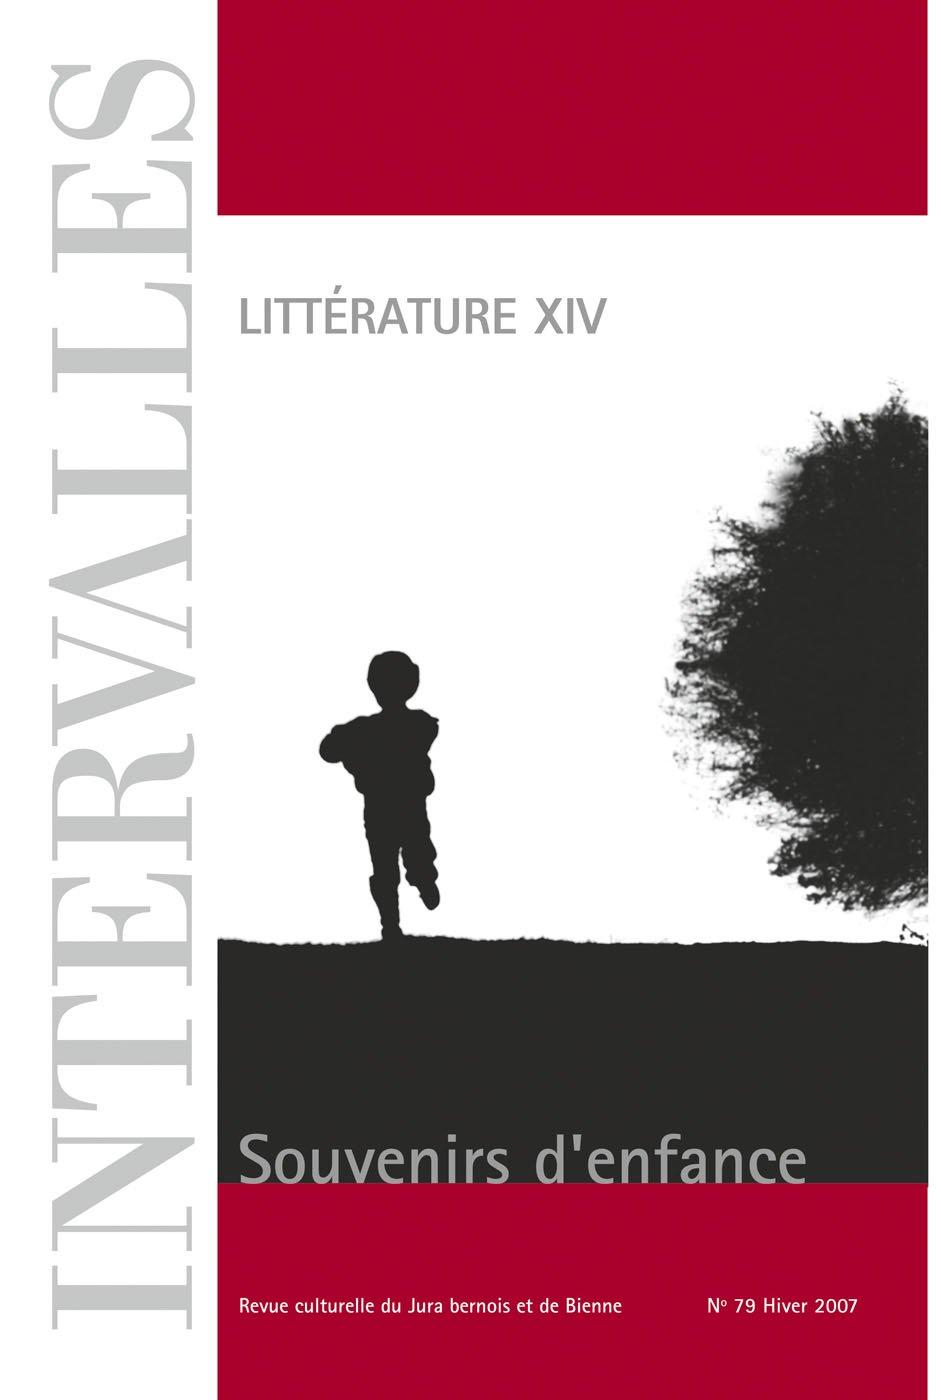 No 79 – Littérature XIV